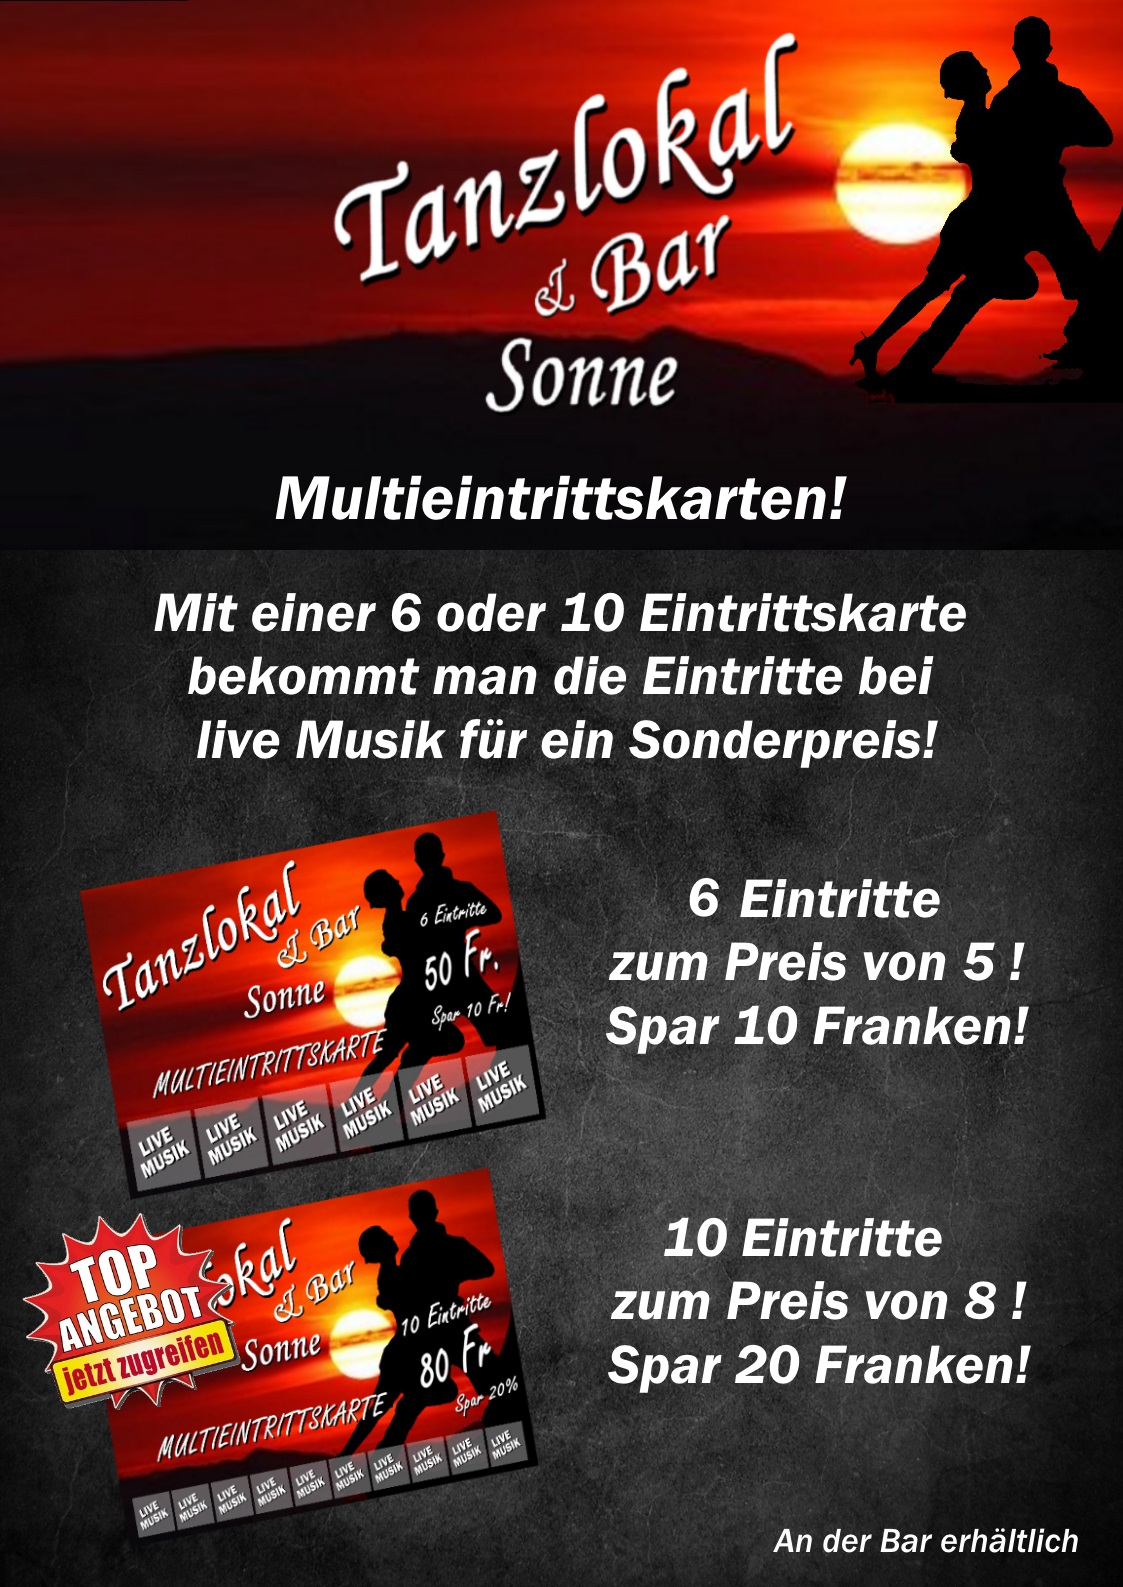 Tanzlokal_Sonne_Mutlieintrittangebot_website